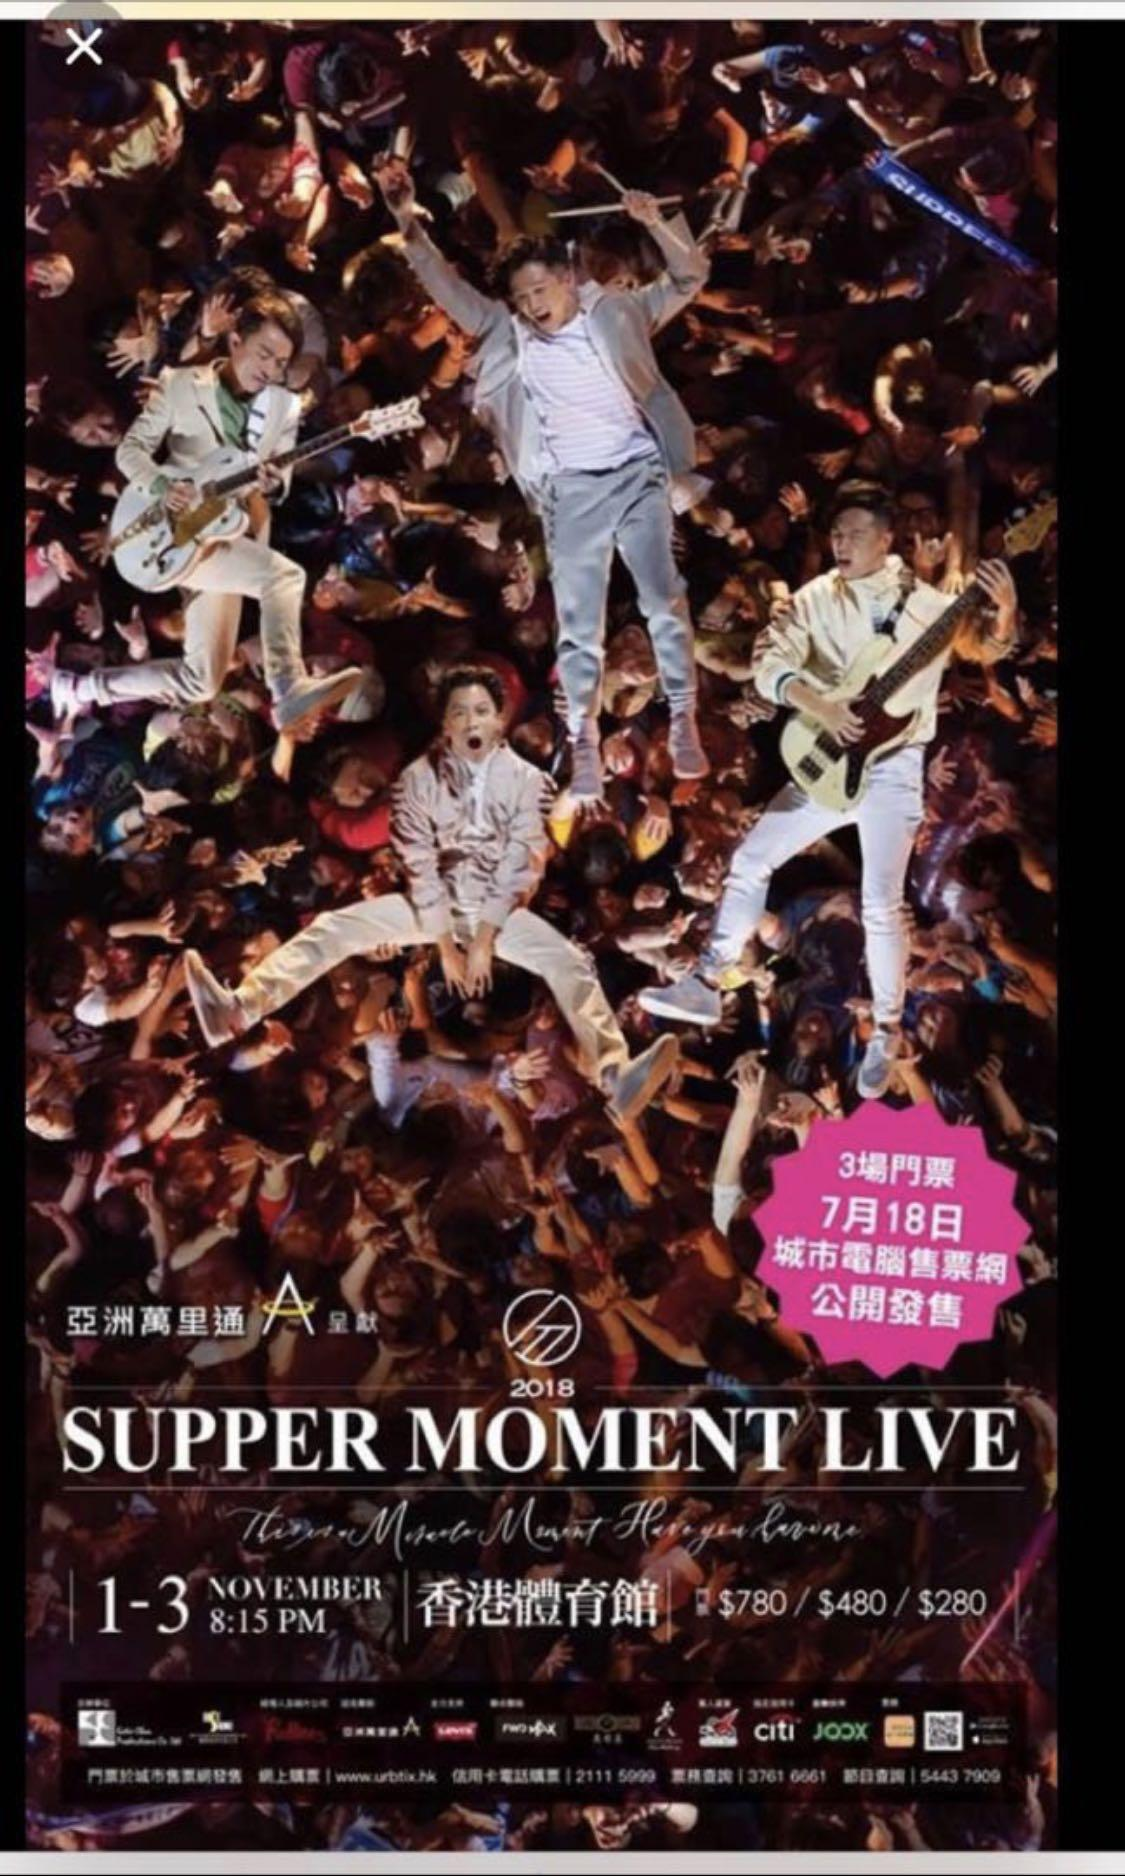 徵 Supper Moment 演唱會 Concert $280飛 二連